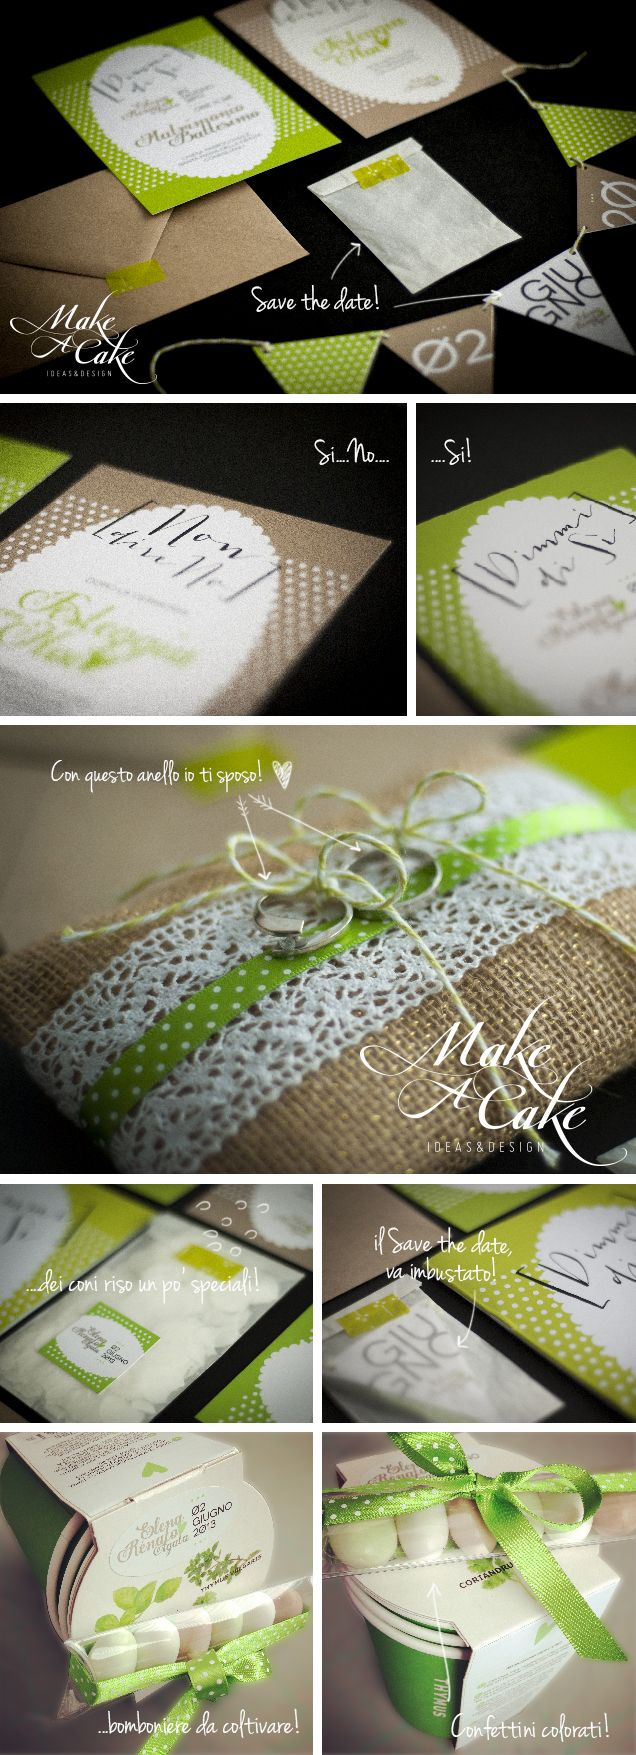 picnic wedding green avana savethedate ideas favor stationery inspiration weddingideas you can find it at www.makeacake.it